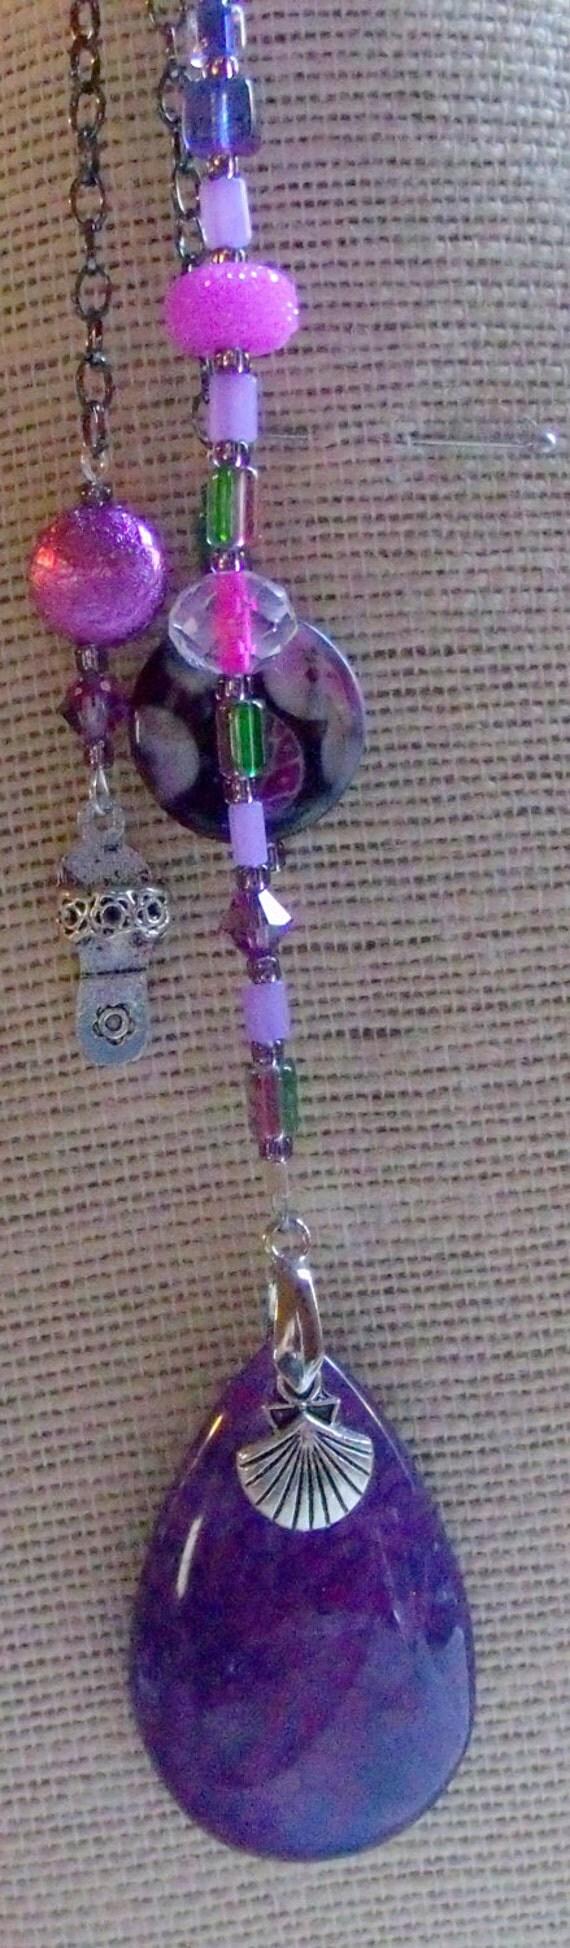 Purple sun catcher - window art - agate pendant  - chakra - reiki - sandal charm - meditation - yoga gift - dorm decor - LizPoriginals